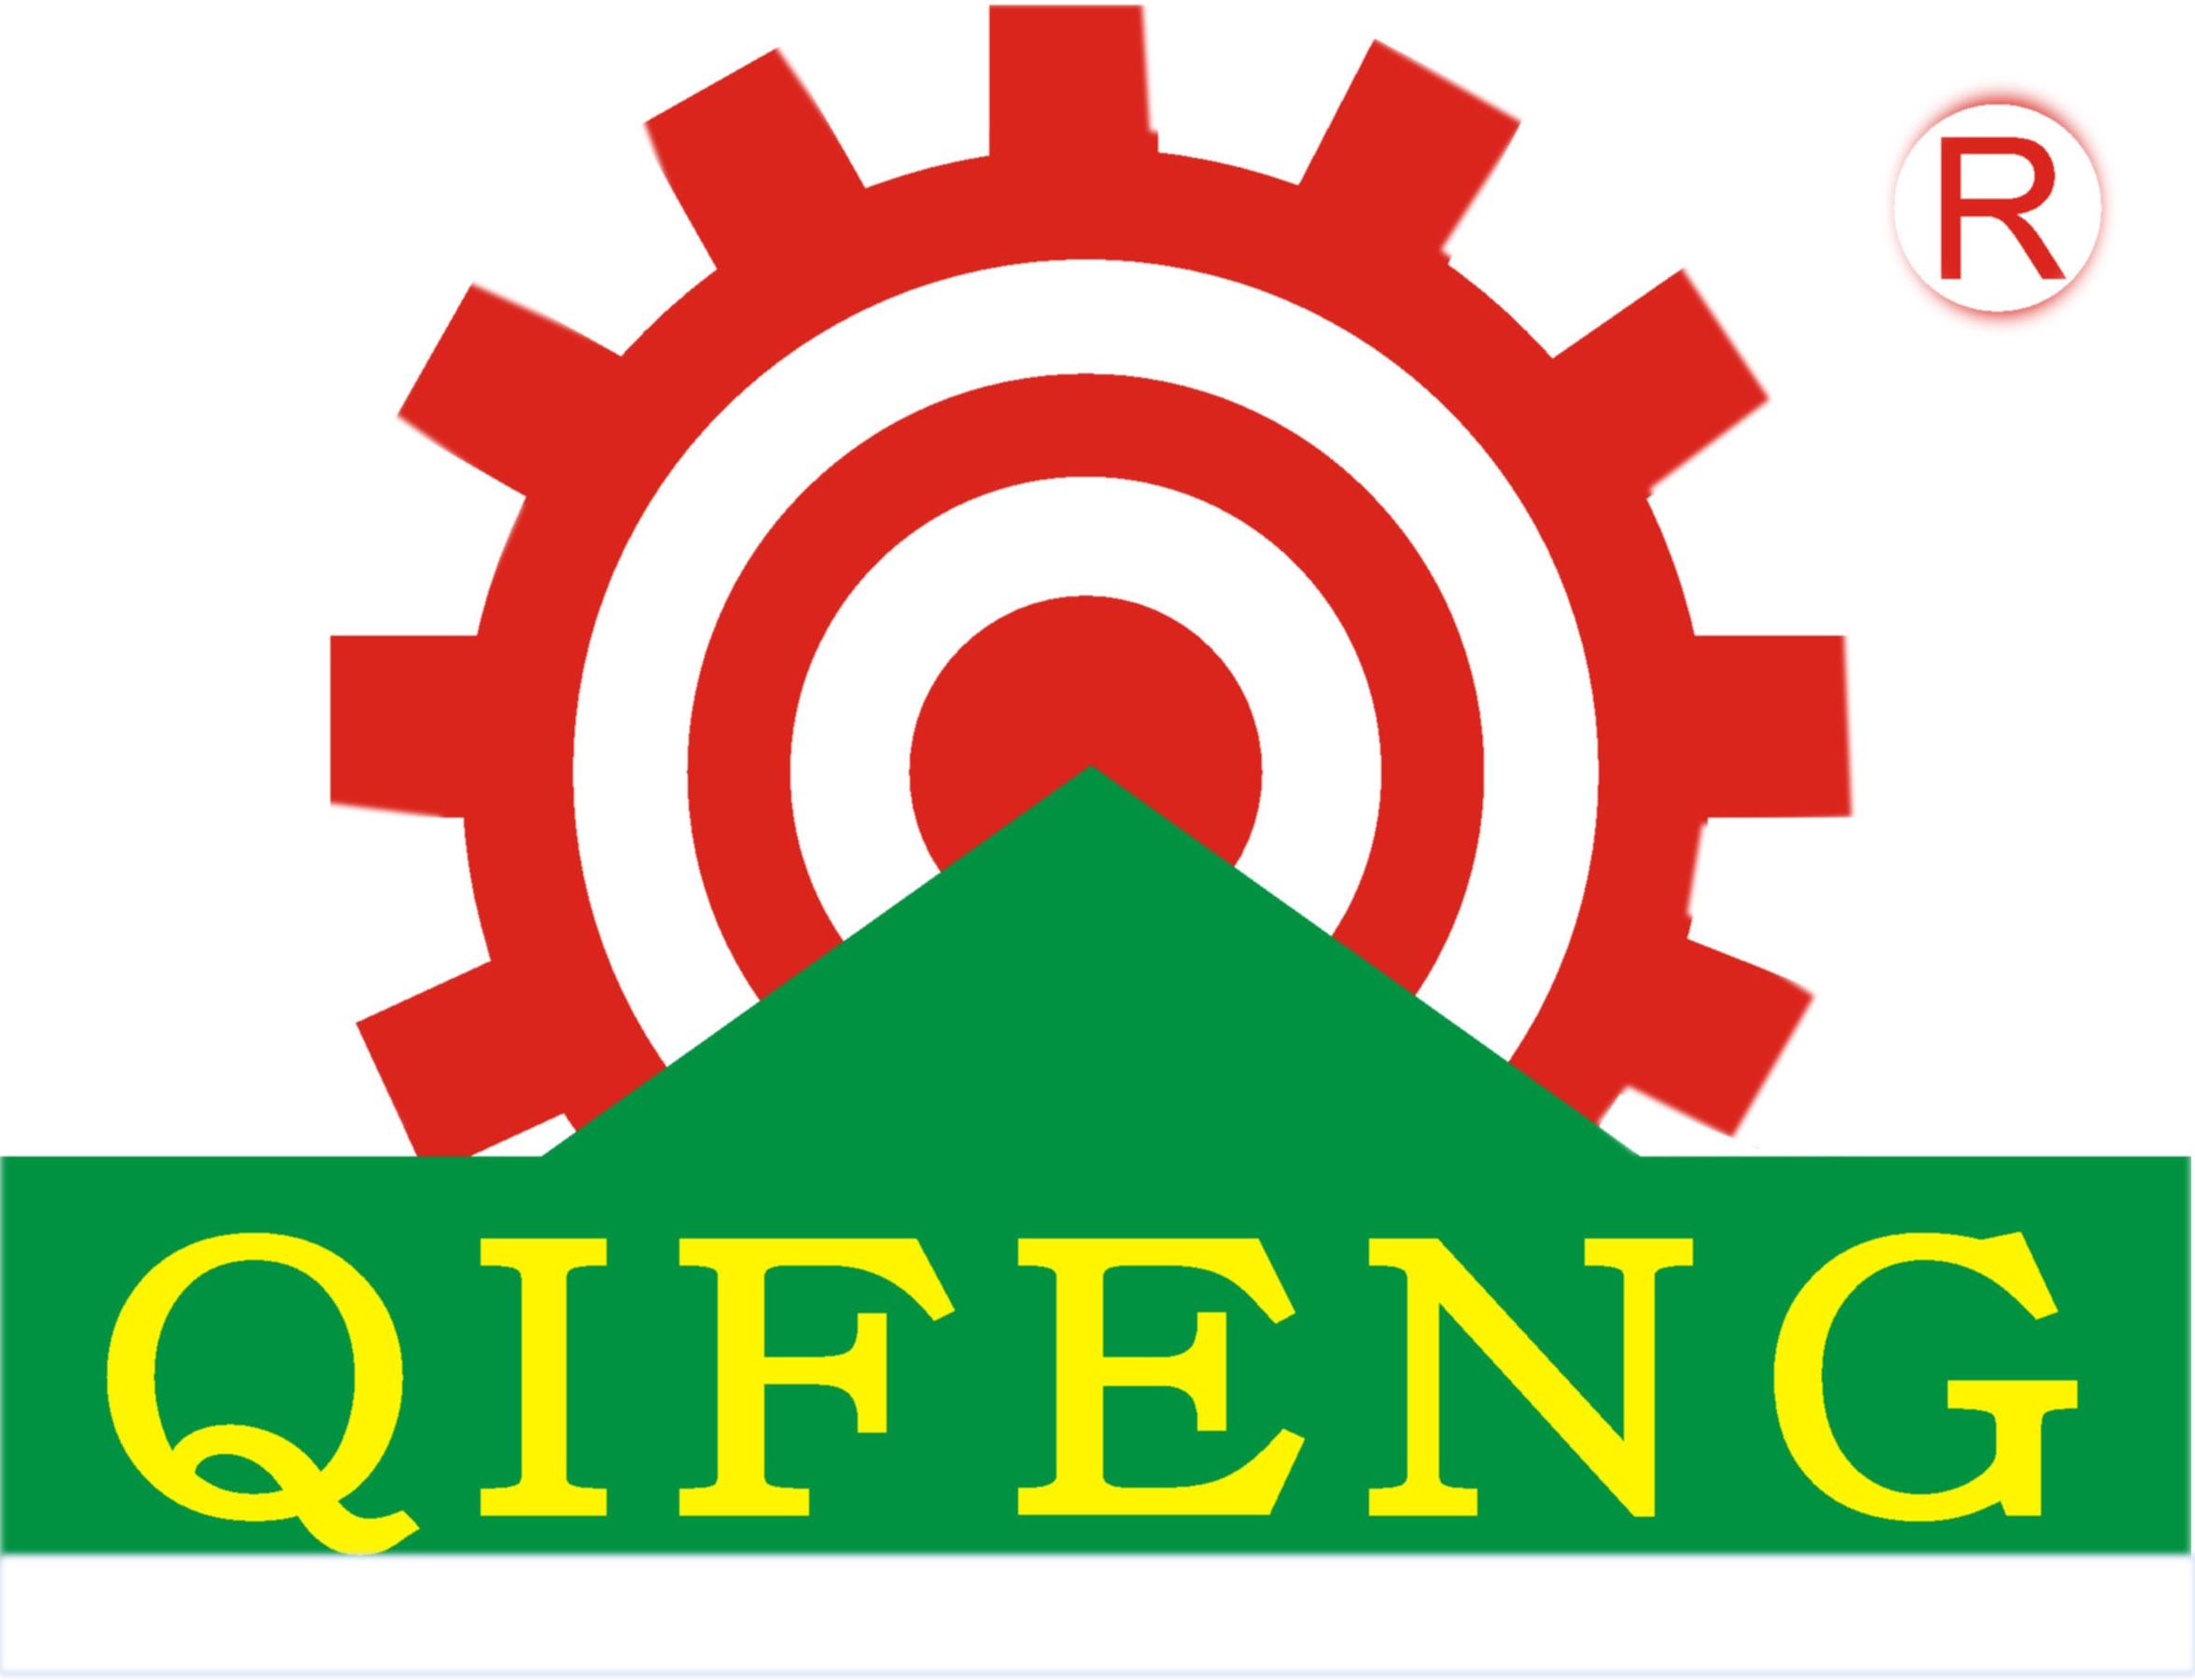 logo logo 标志 设计 图标 2352_1800